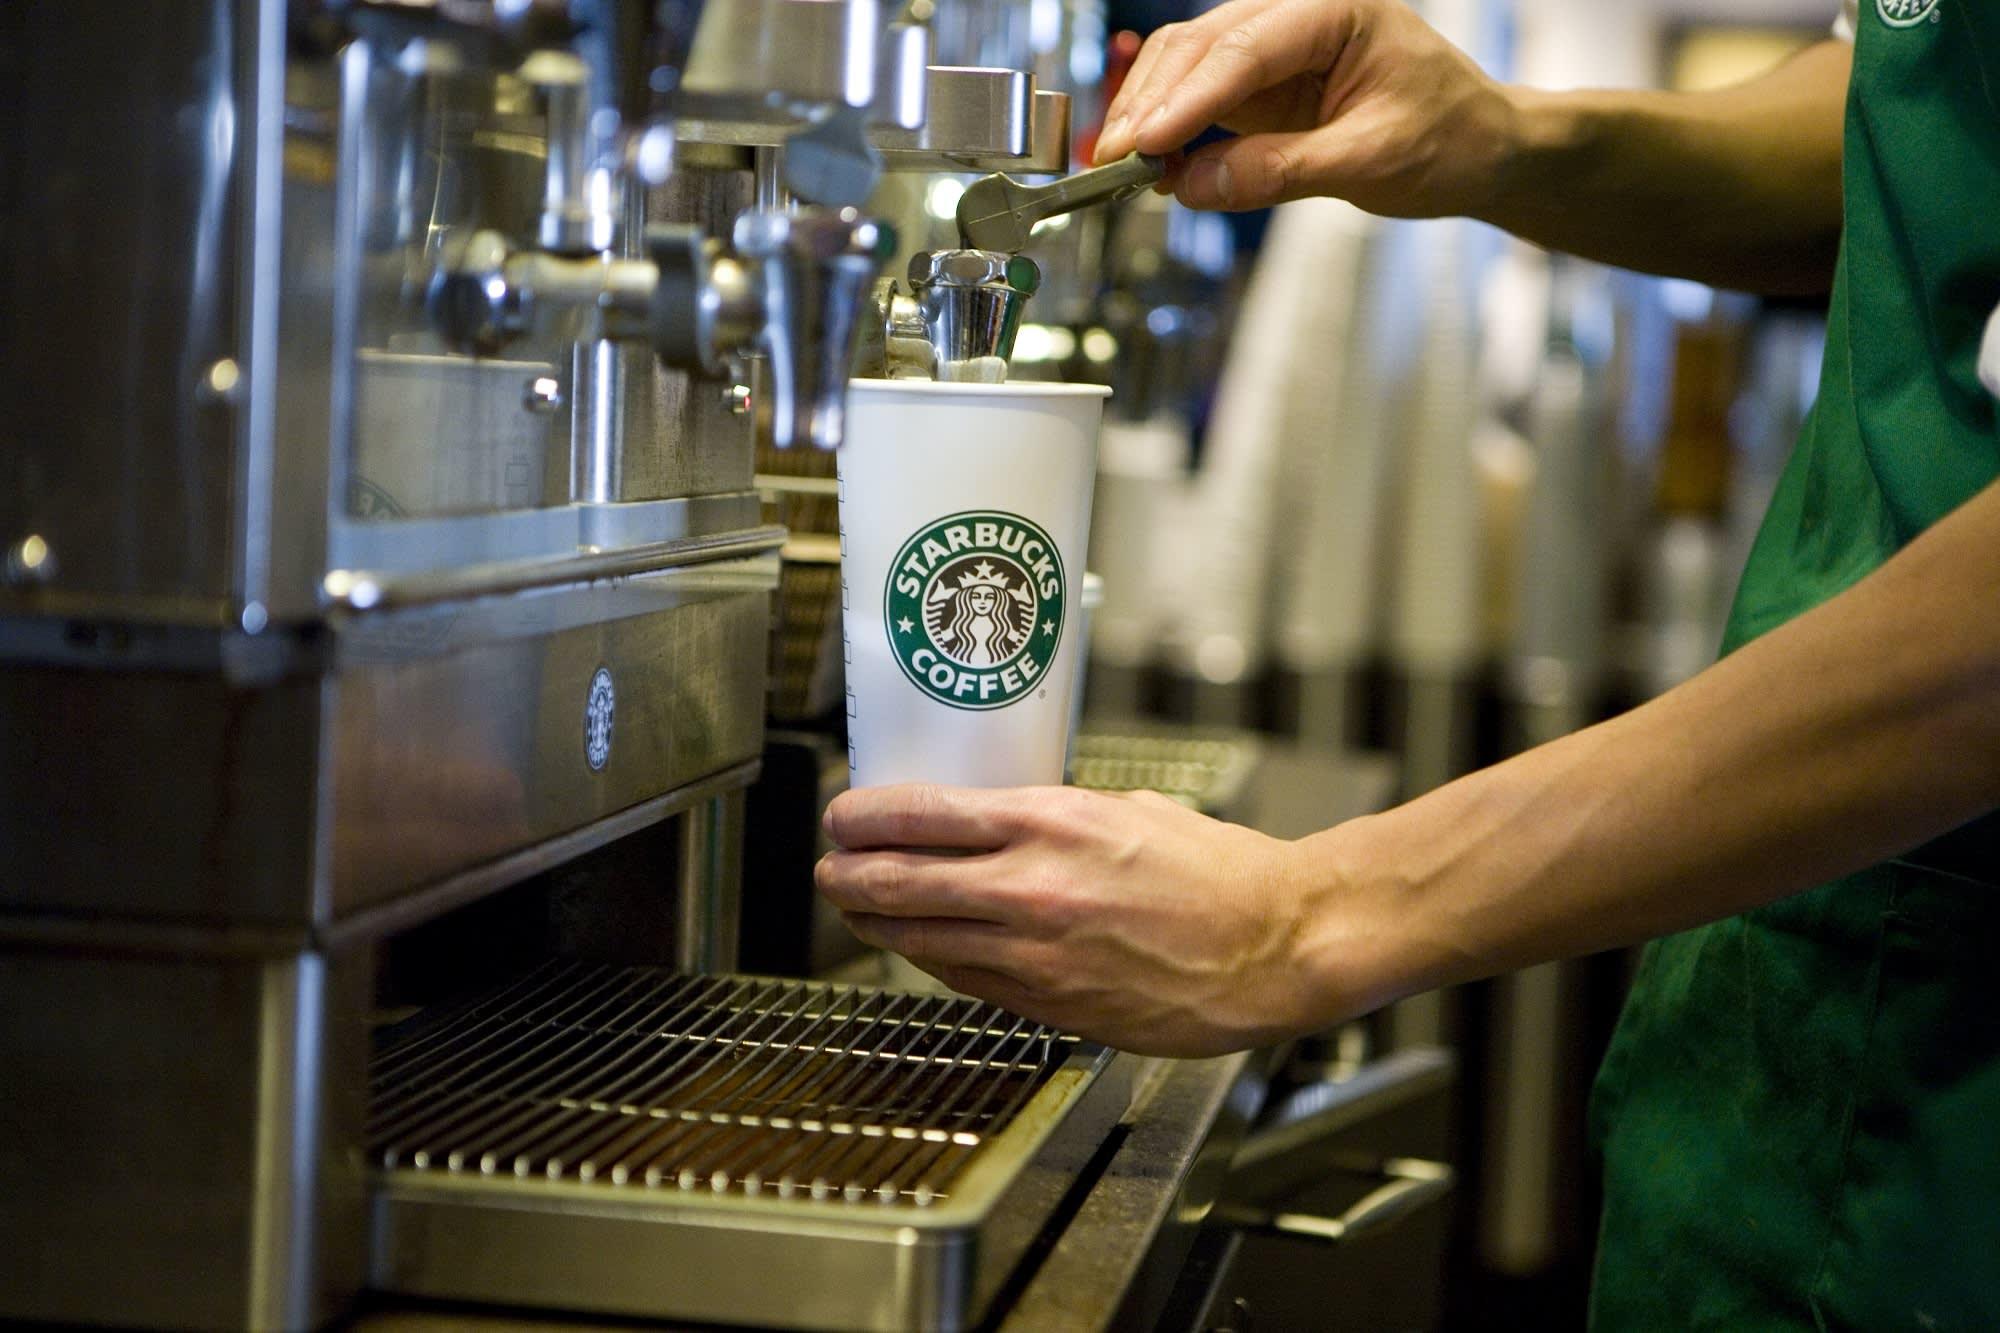 Starbucks may be bottoming after painful pullback, TradingAnalysis.com's Todd Gordon says